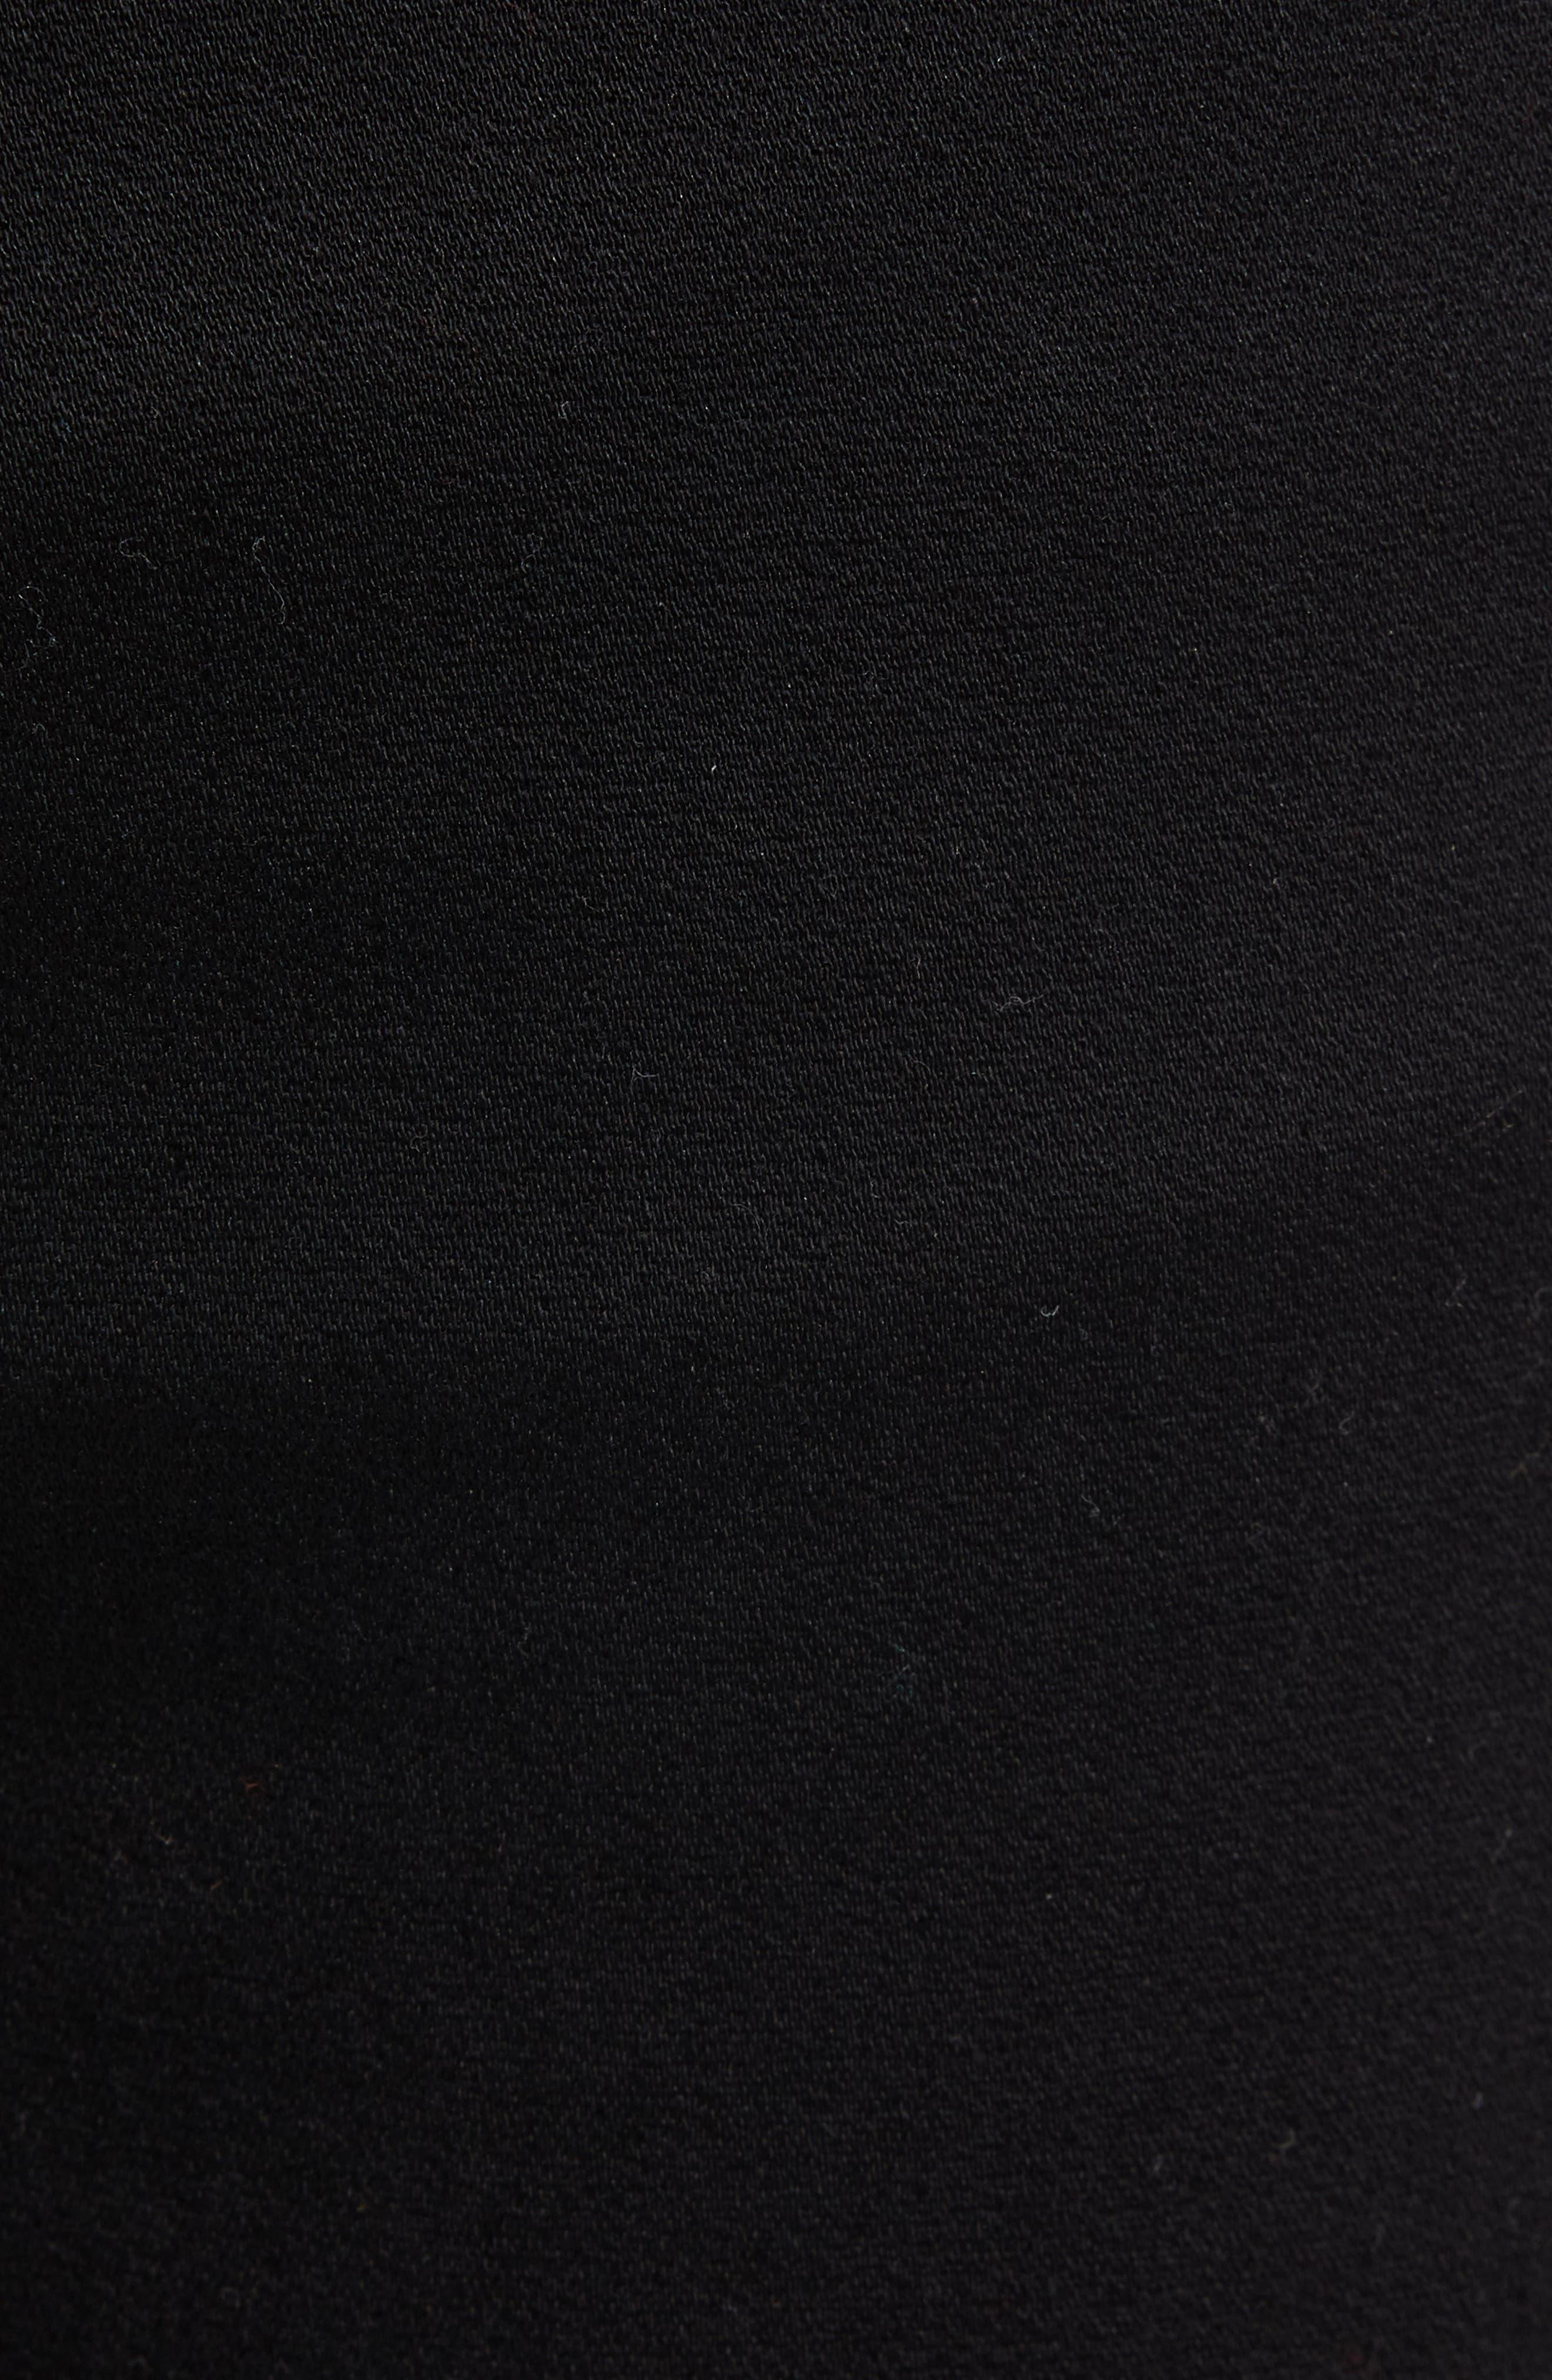 734 Skinny Fit Jeans,                             Alternate thumbnail 5, color,                             BLACK